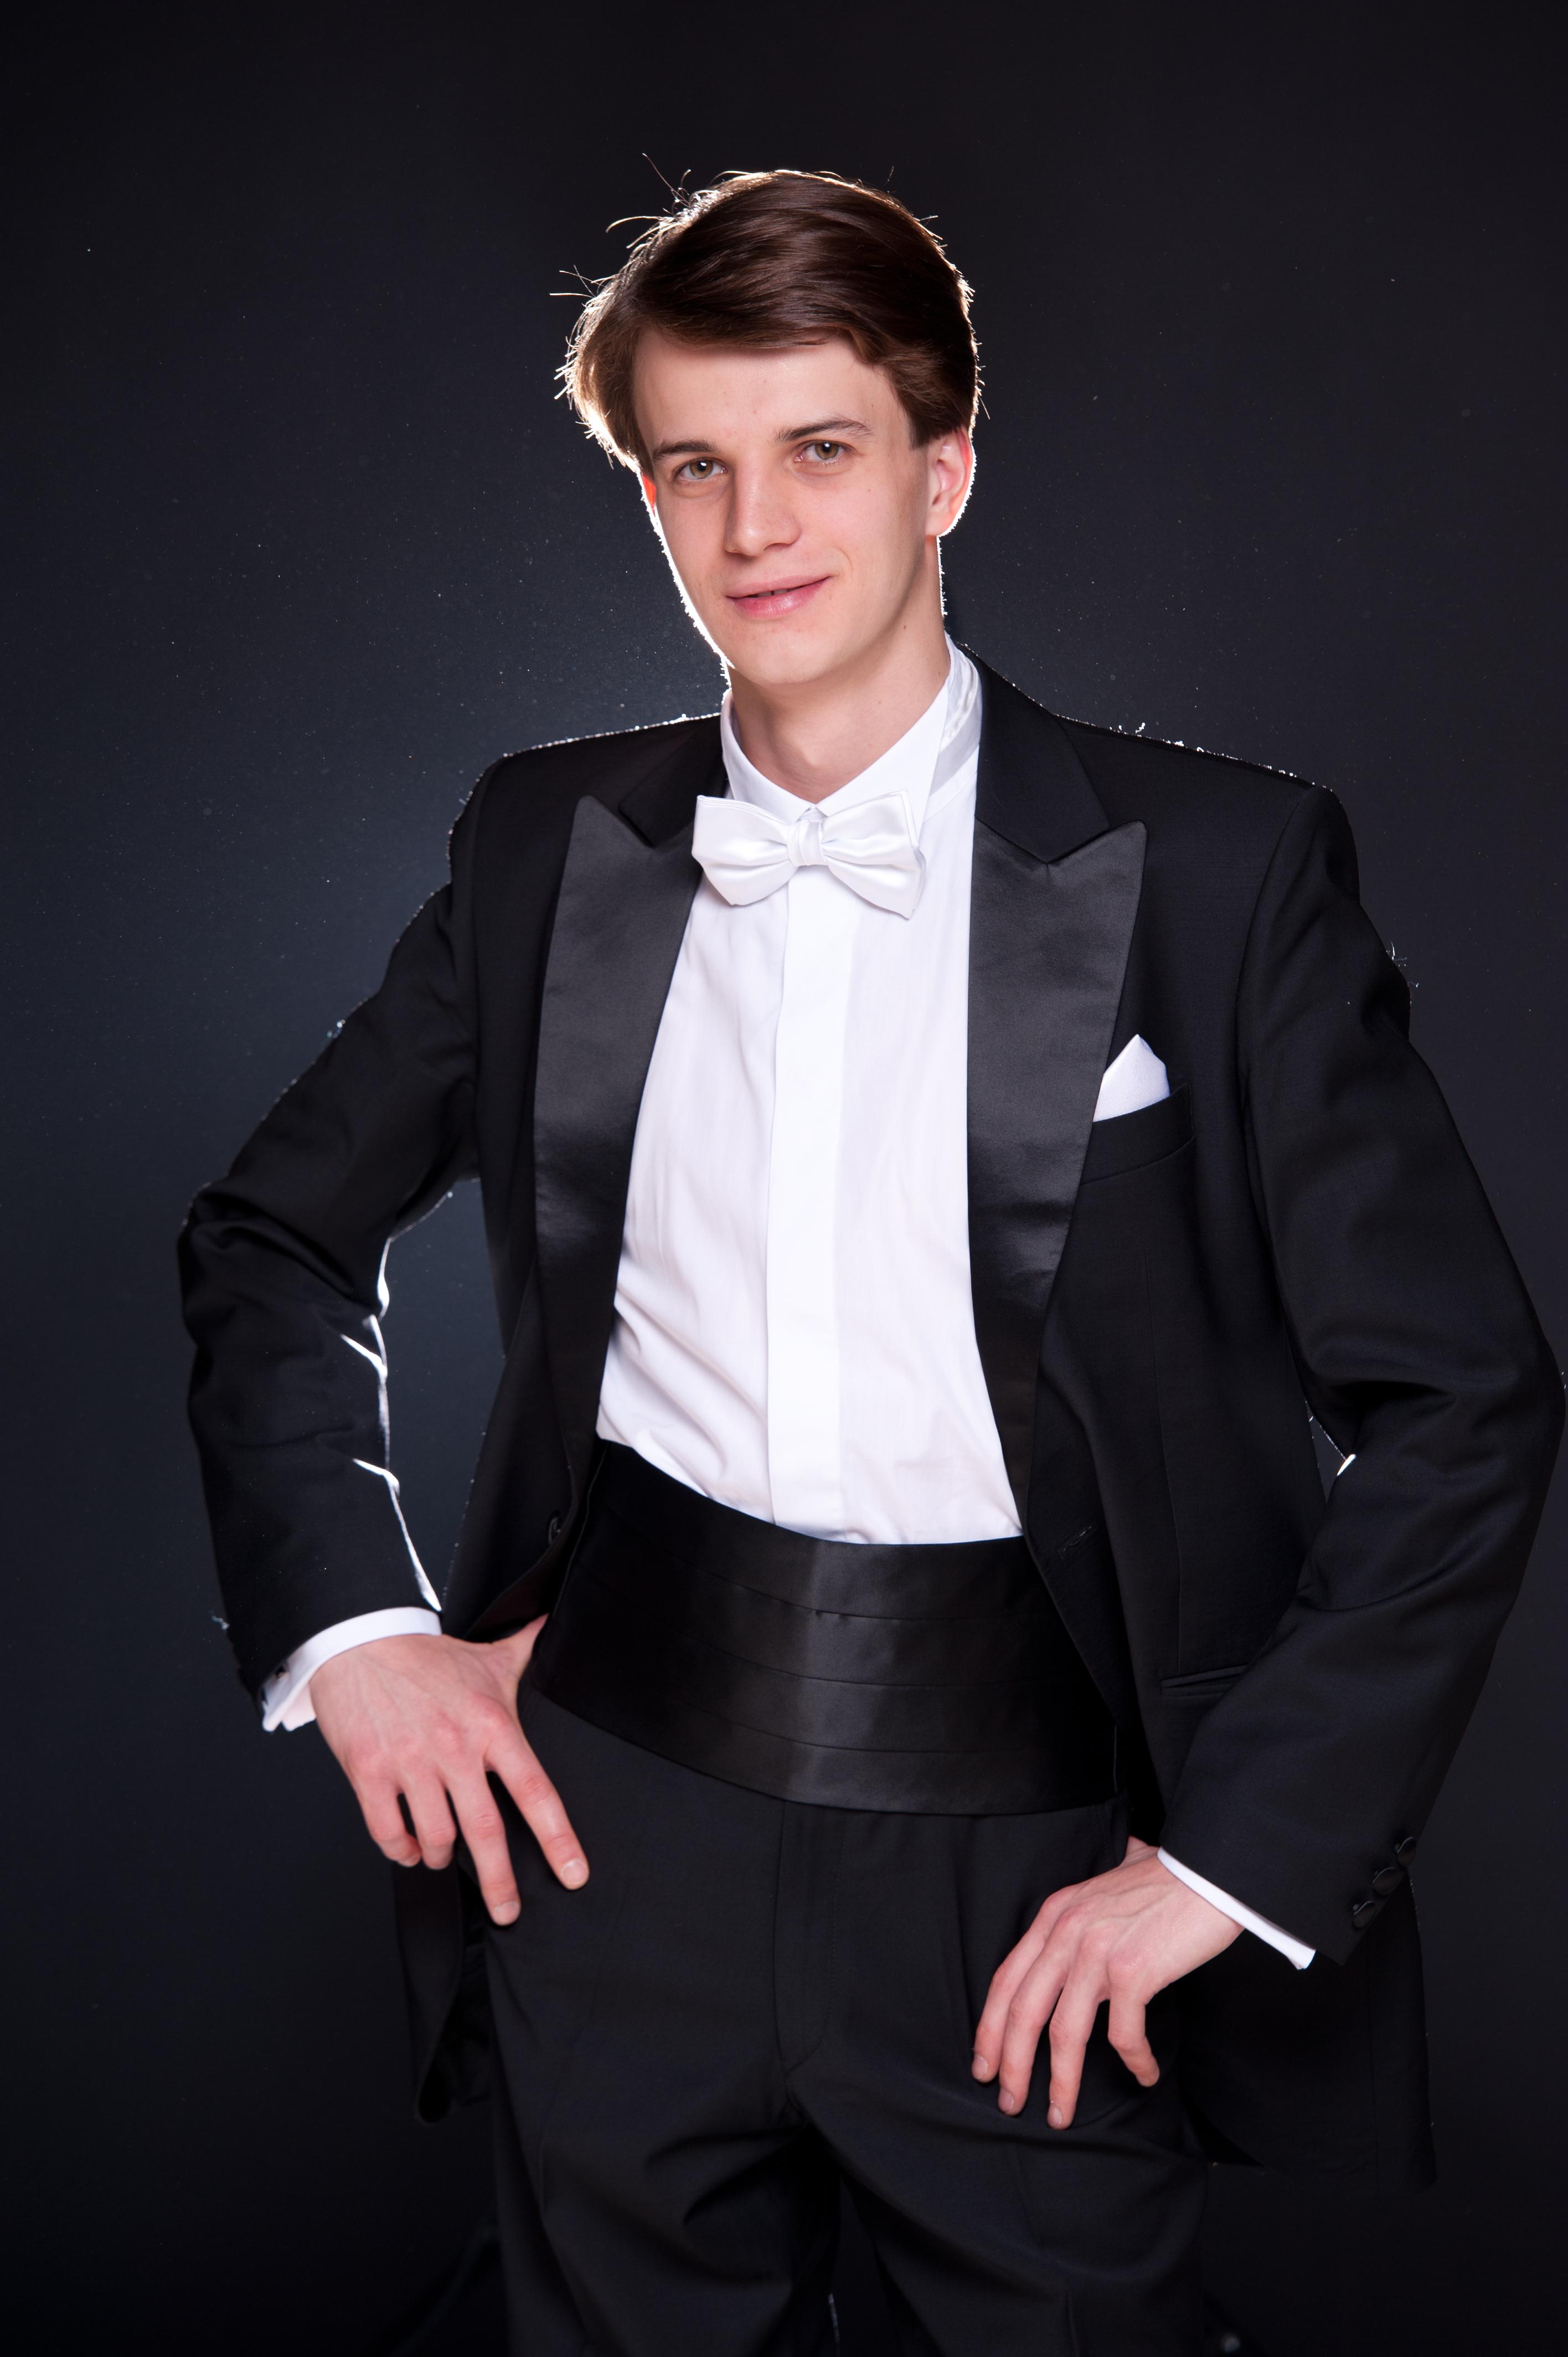 Alexander Sinchuk